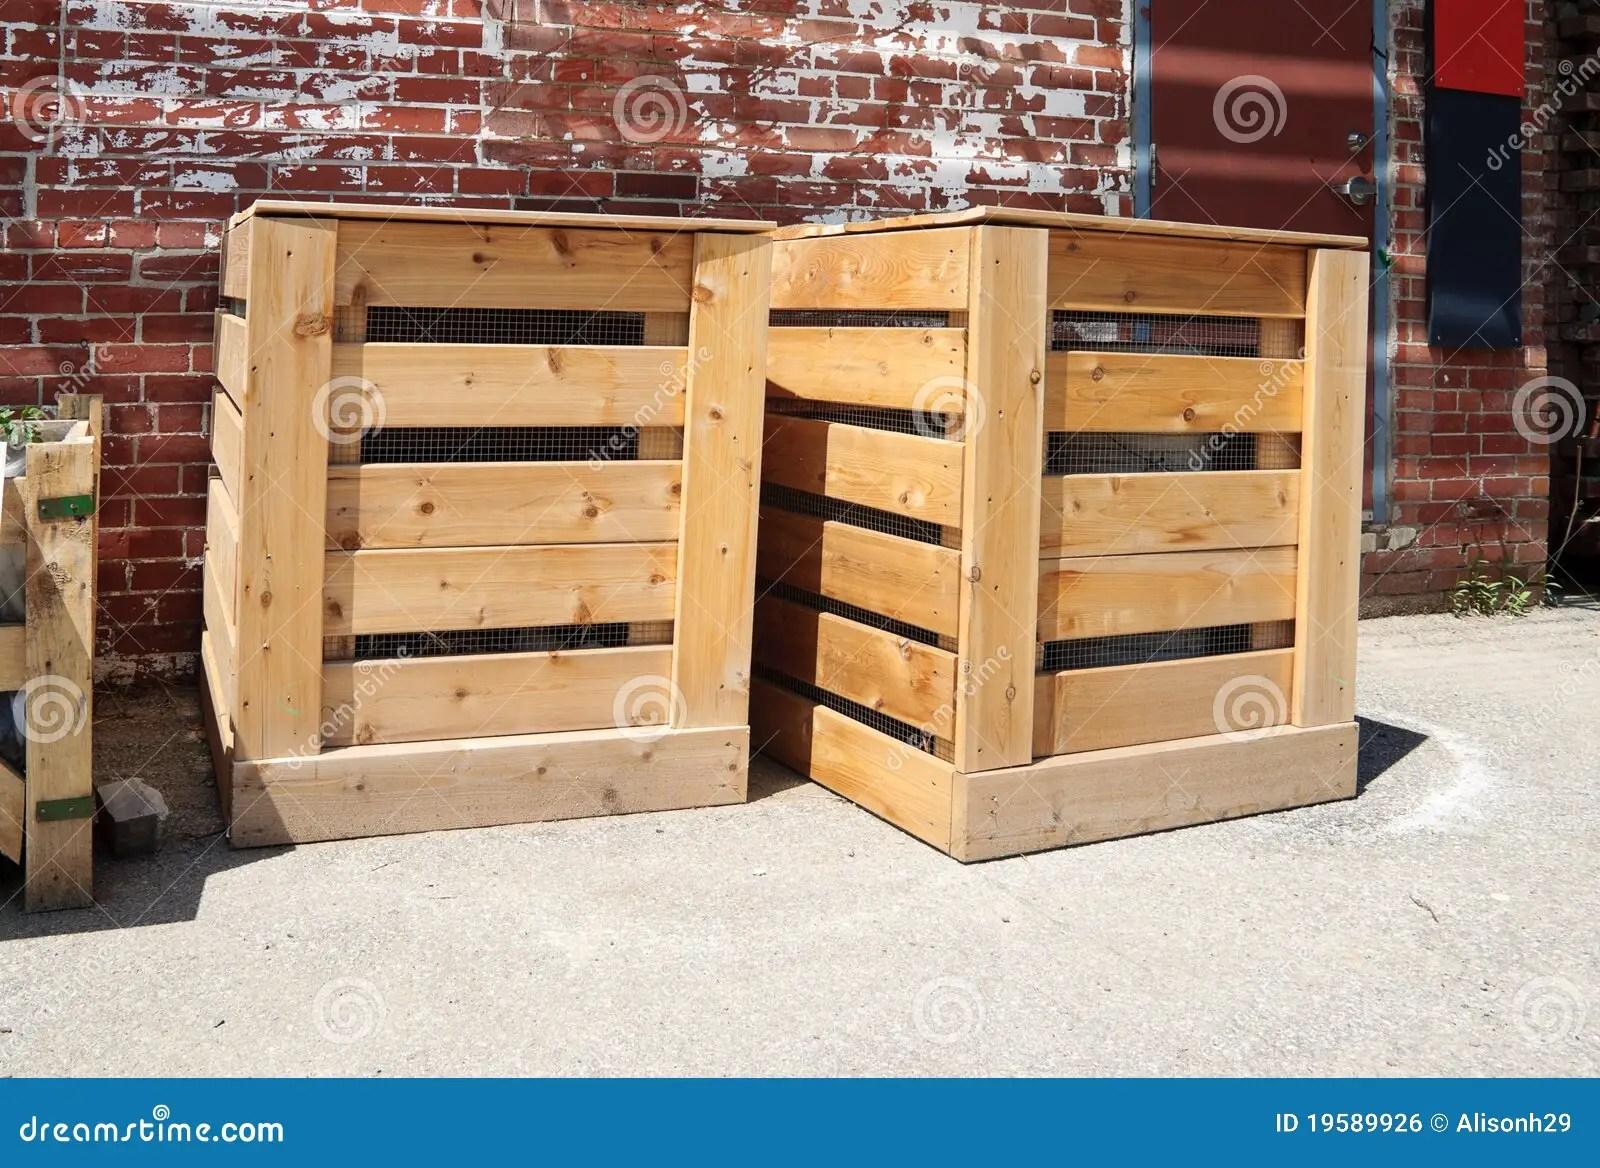 kitchen compost container food slicer 框堆肥木库存照片 图片包括有废物 罗盘箱 容器 从事园艺 庭院 花匠 容器从事园艺木的废物